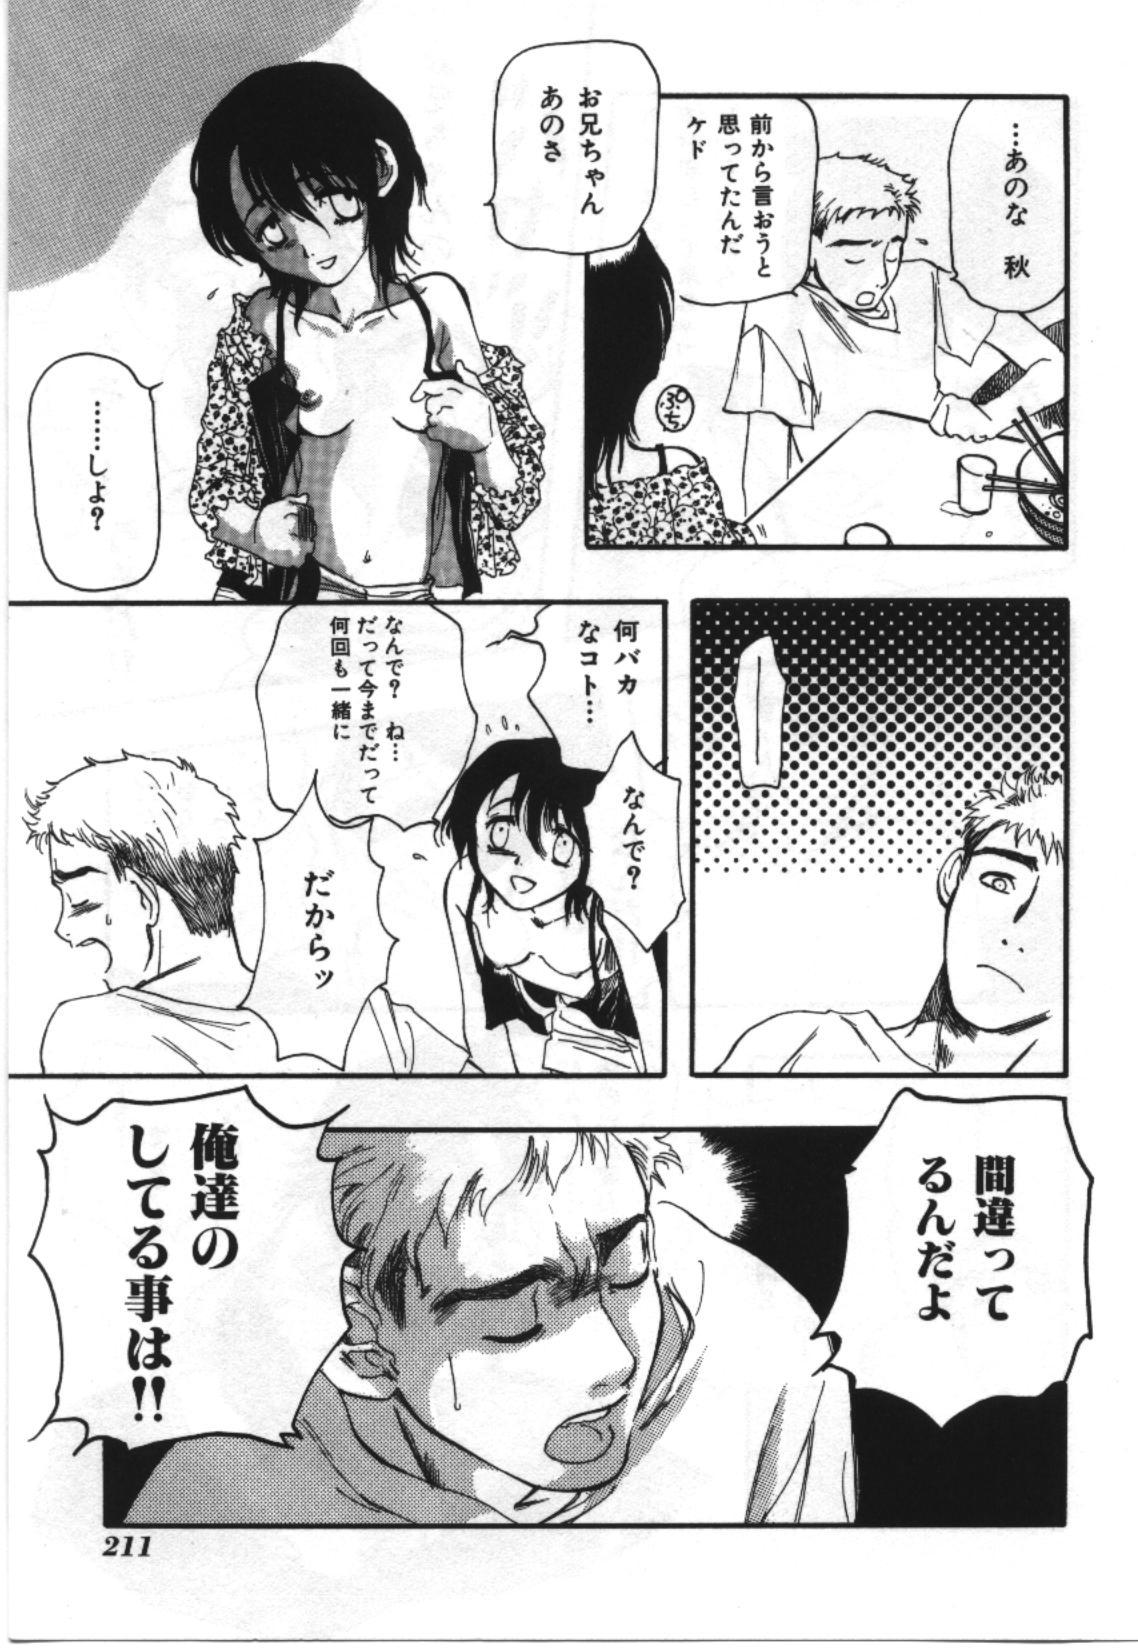 Imouto Koishi 2 210